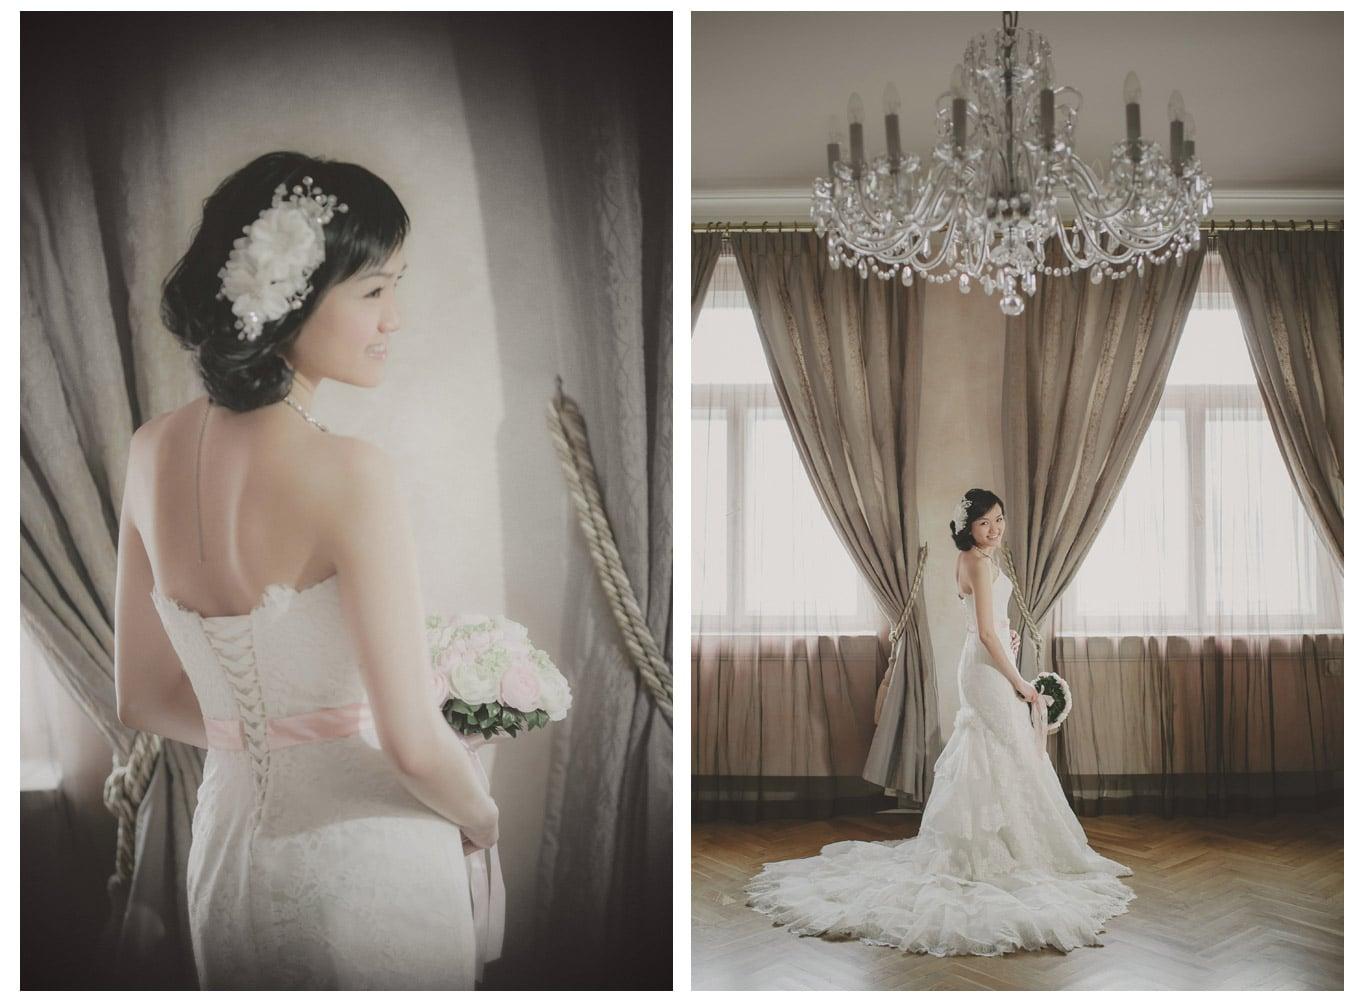 Prague pre wedding / Suki & Steven / portrait session at the Pachtuv Palace